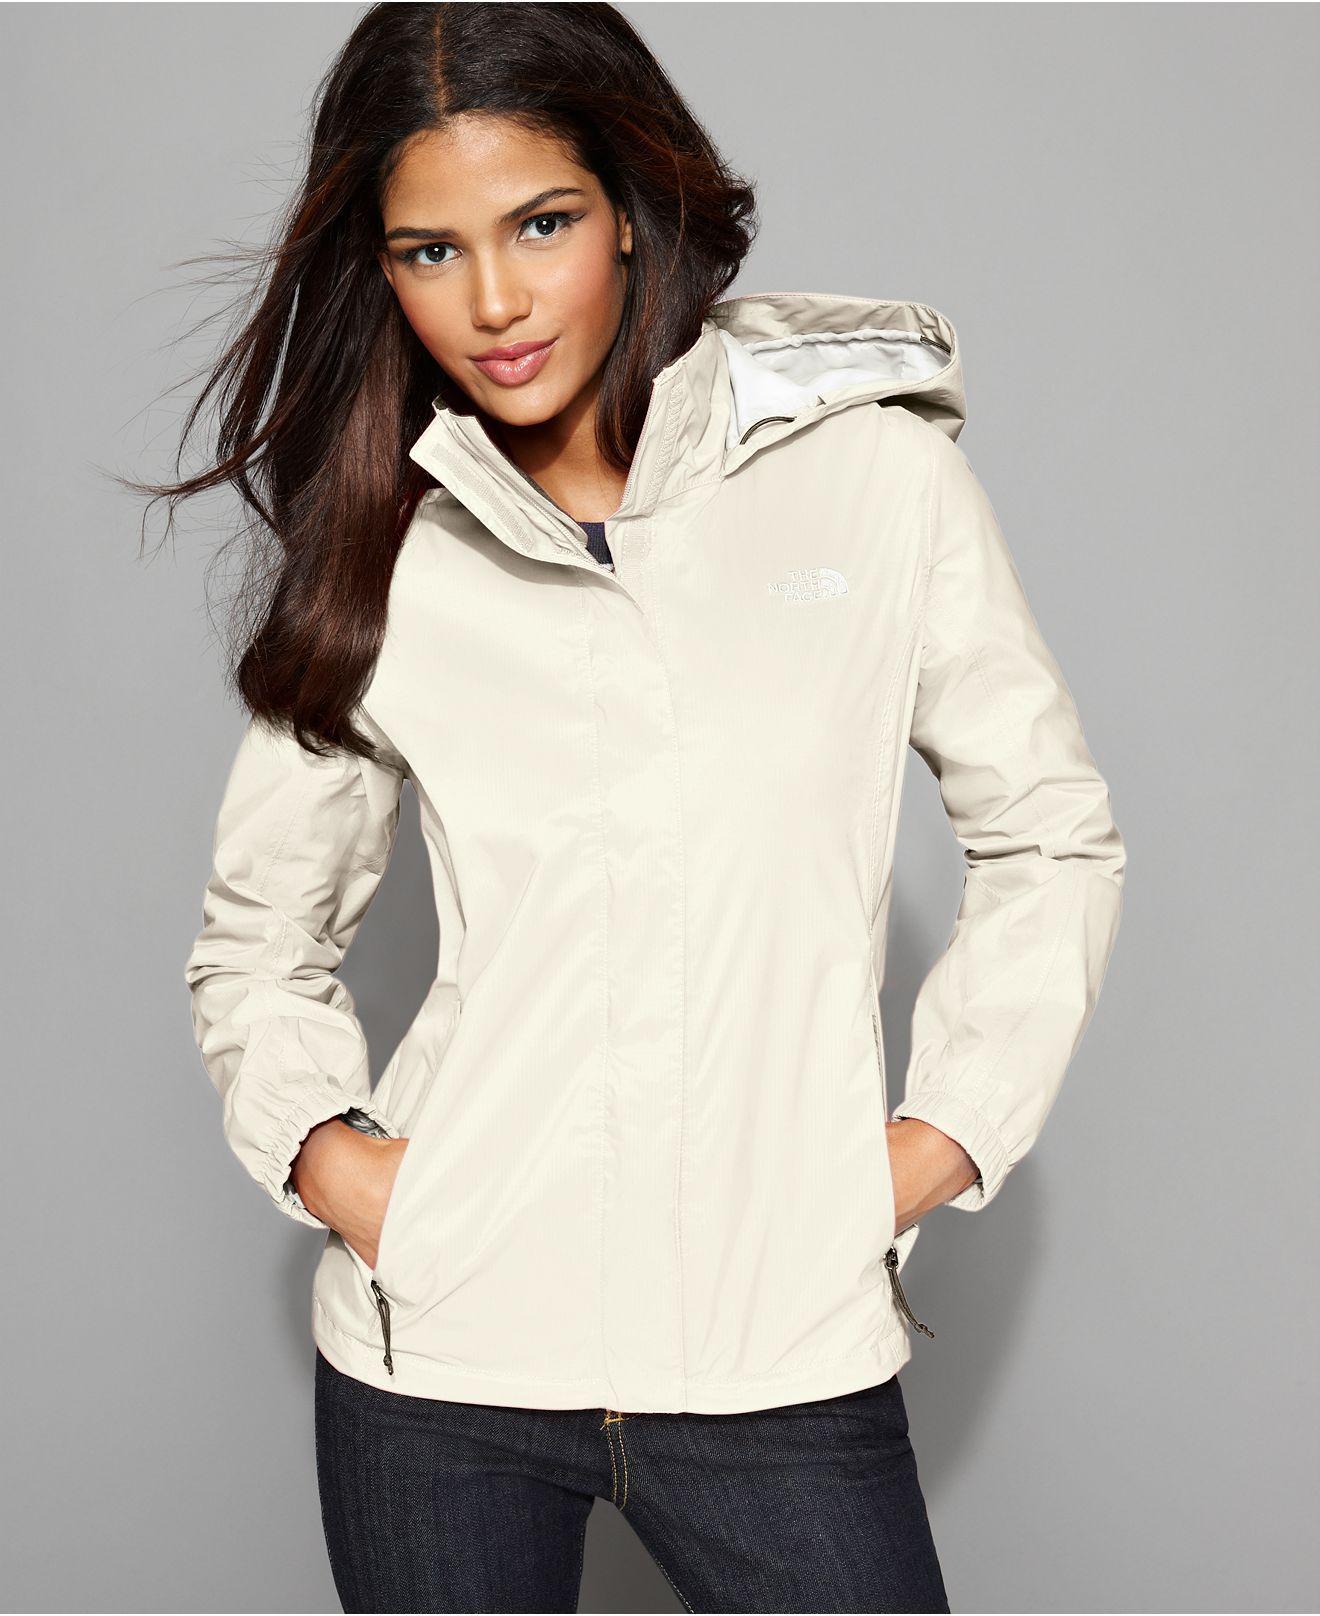 80 North Face Lightweight Rain Jacket Macy S Blazer Jackets For Women Lightweight Rain Jacket North Face Jacket [ 1616 x 1320 Pixel ]